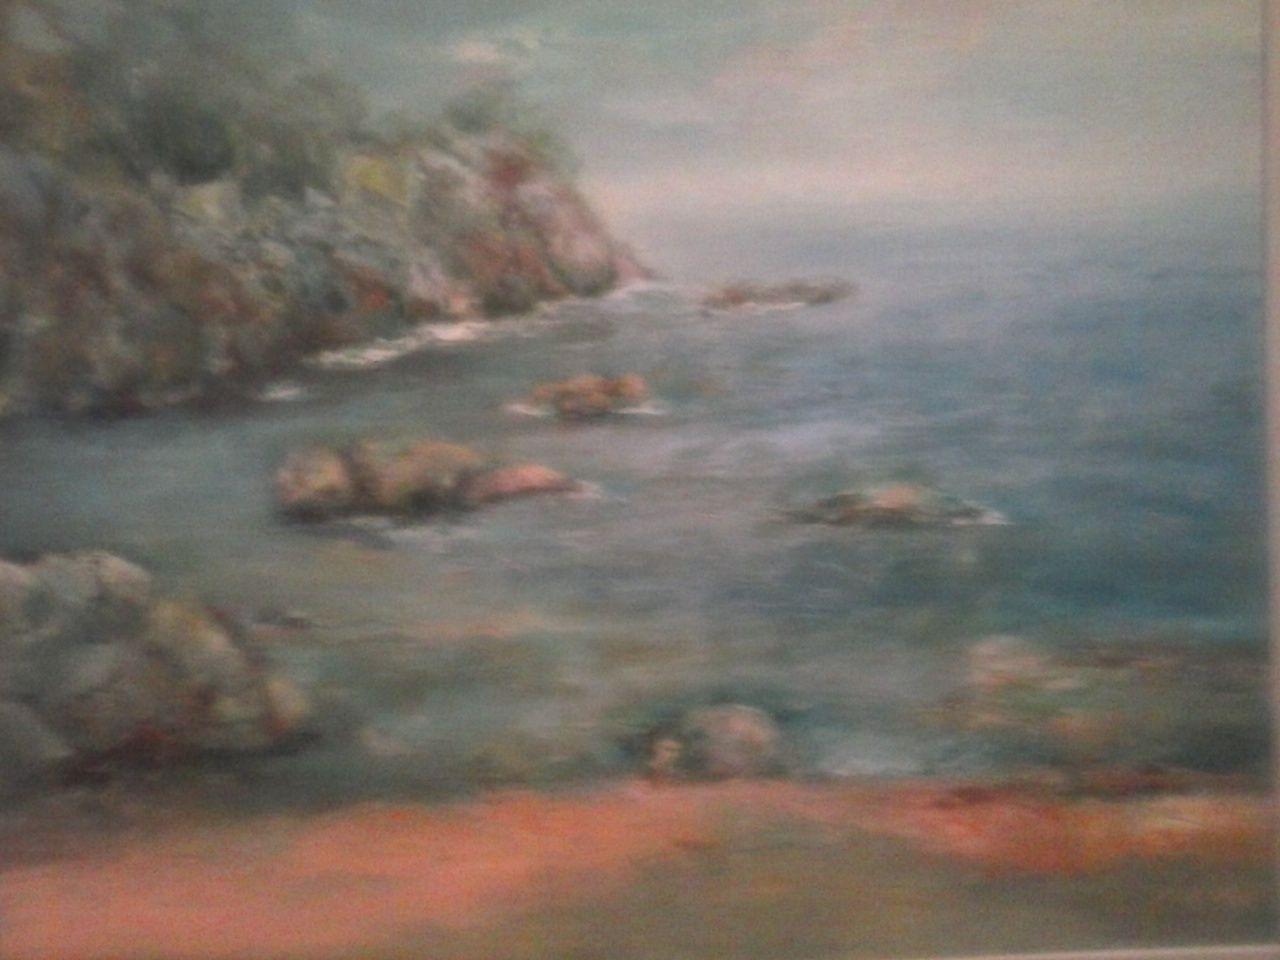 Costa Brava óleo 81x 65 pintado por Marga Bos